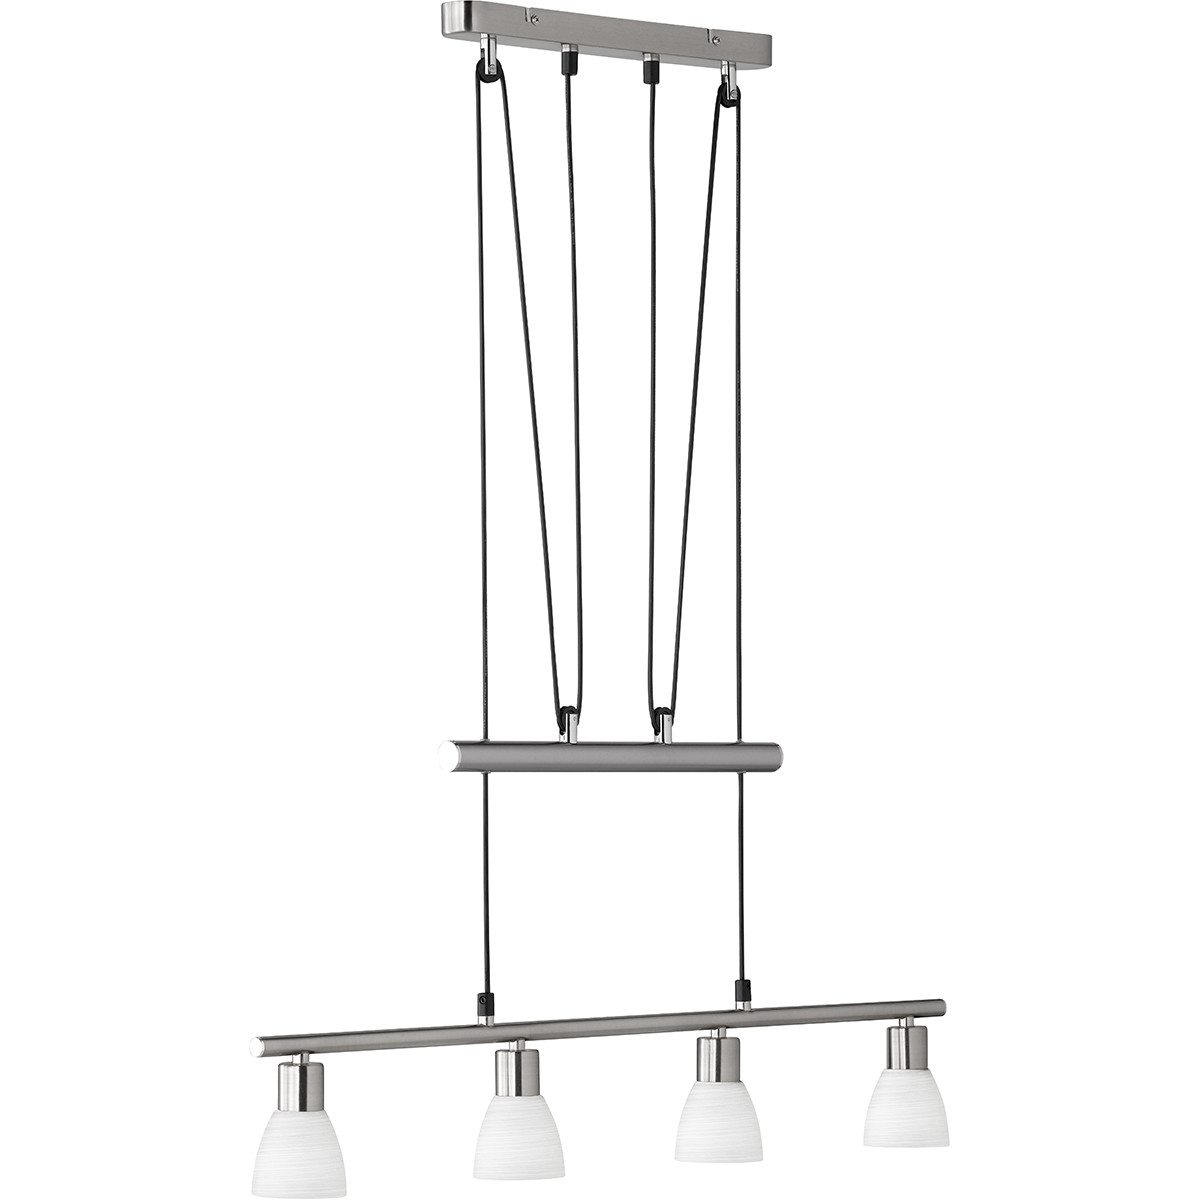 LED Hanglamp - Trion Caru - 12W - G9 Fitting - Warm Wit 3000K - Dimbaar - Rechthoek - Mat Nikkel - A